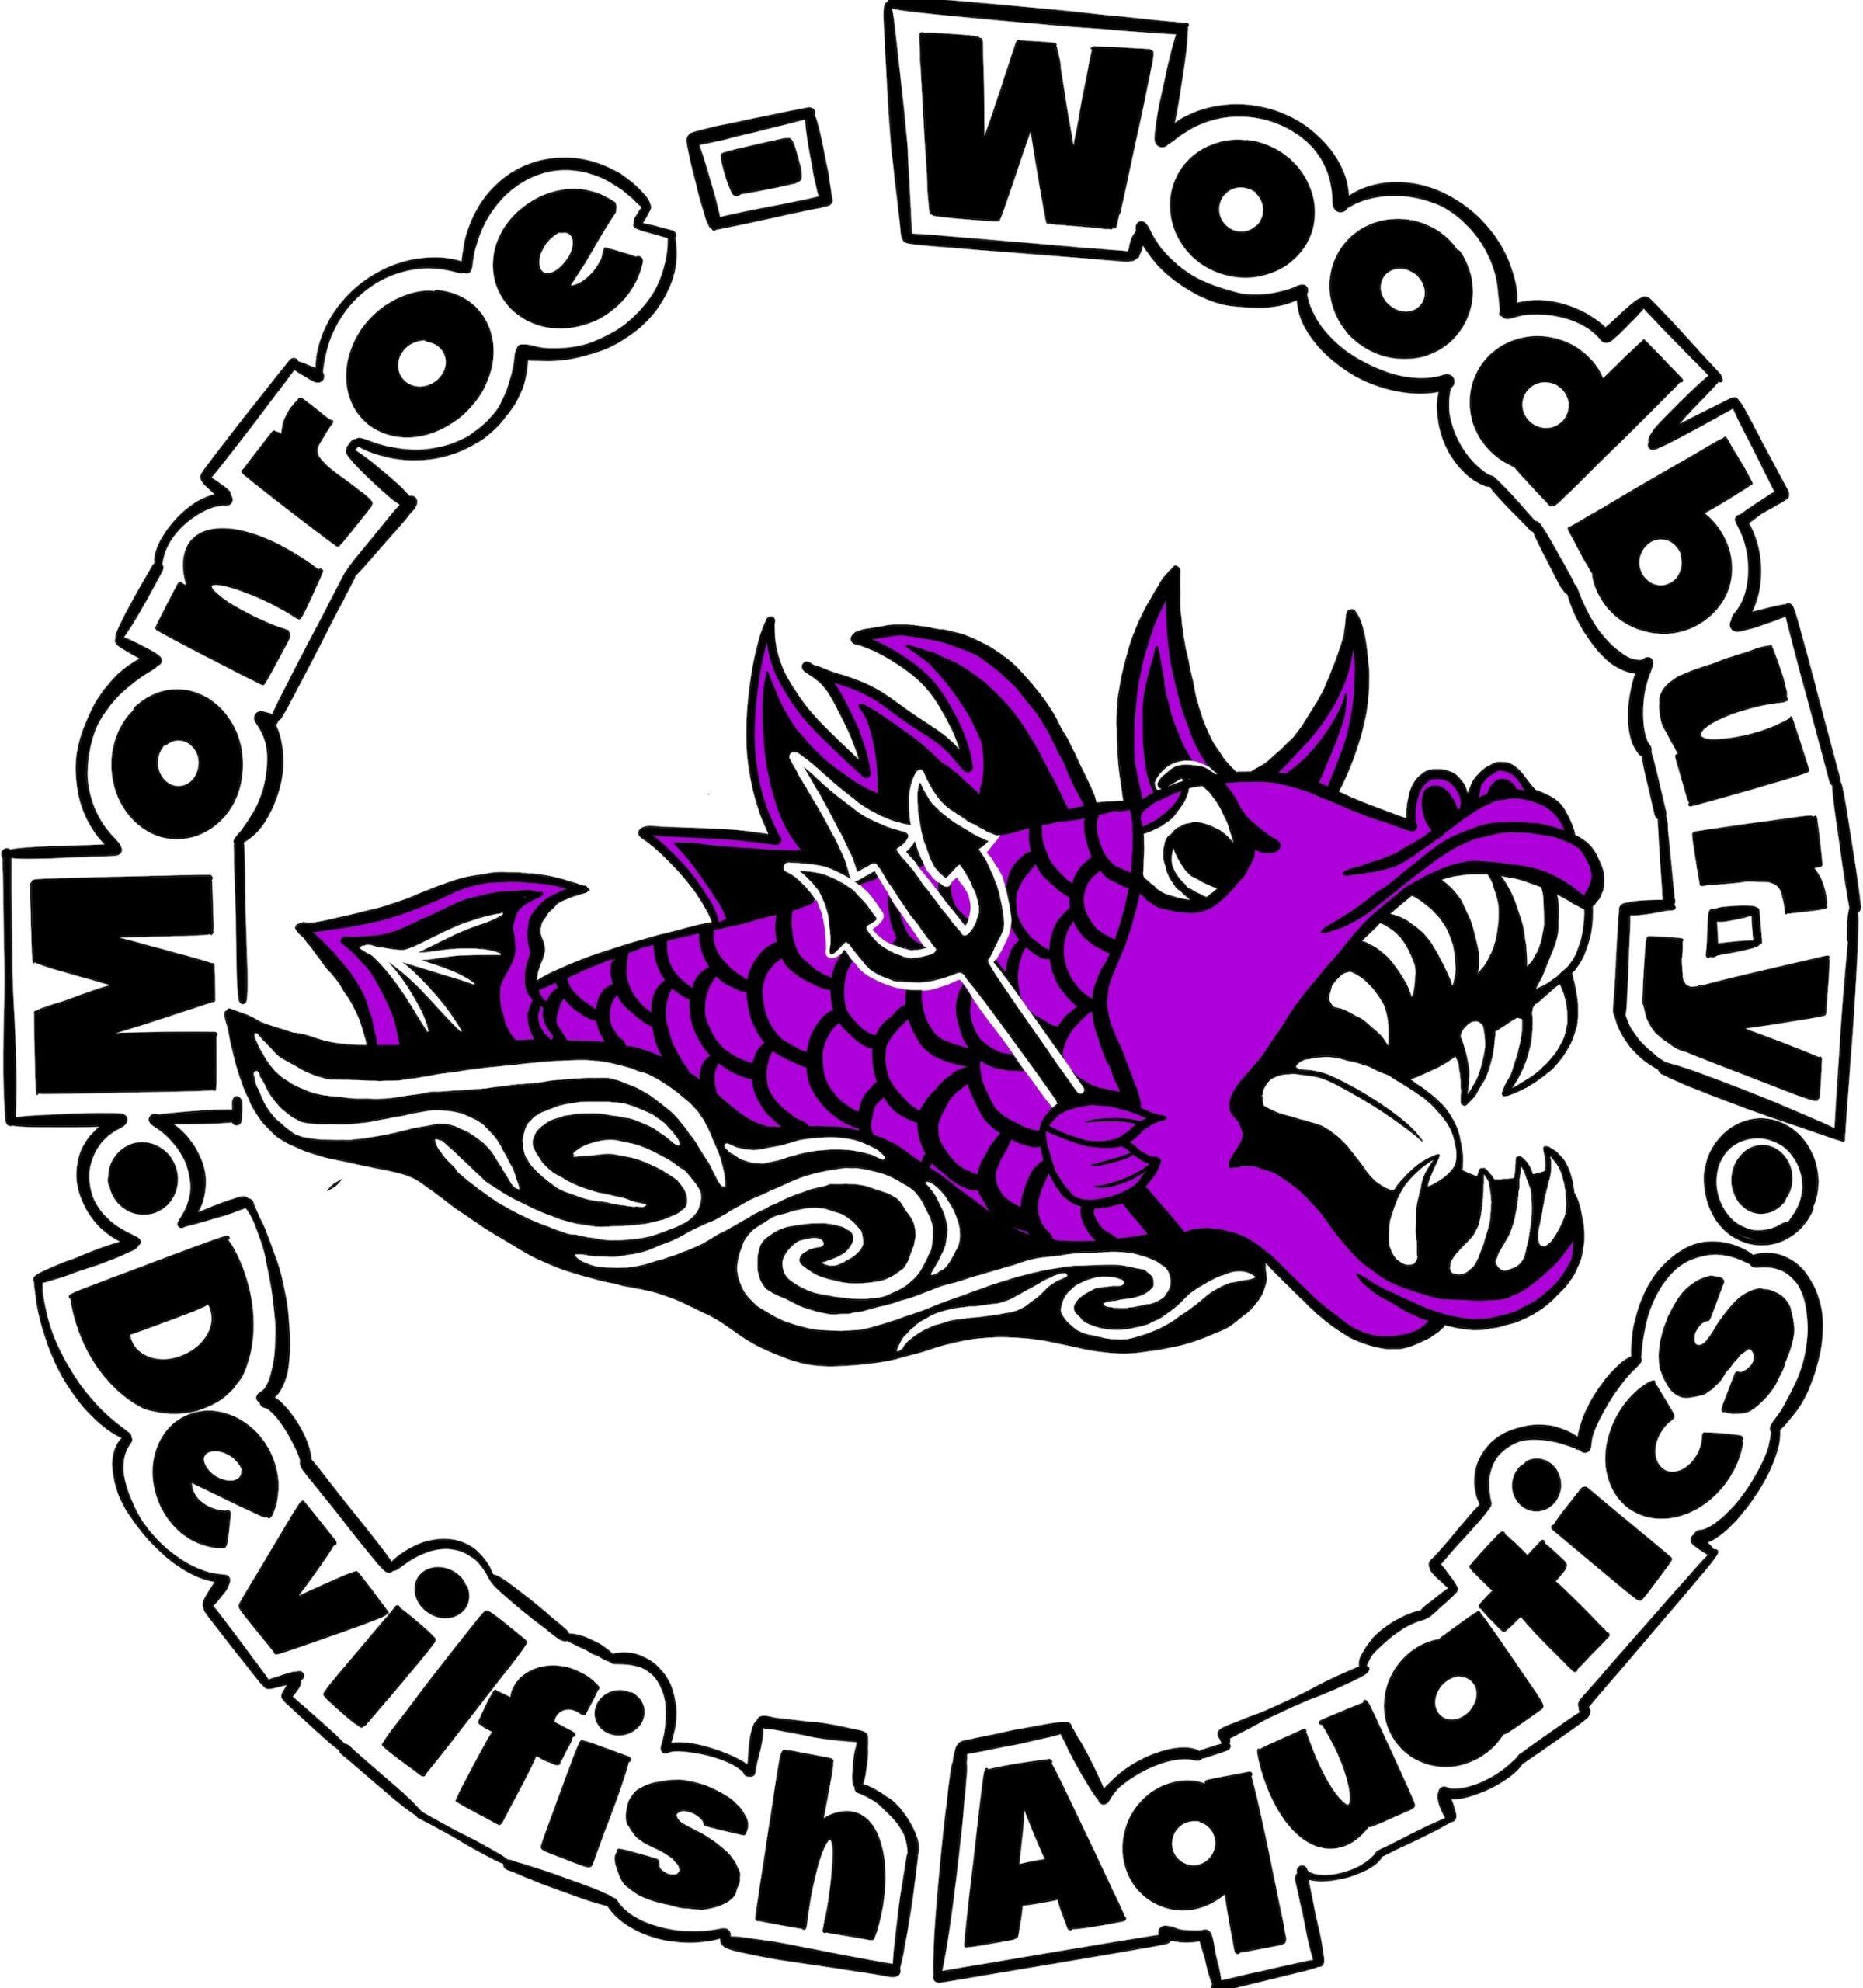 Monroe - Woodbury Devilfish Aquatics logo